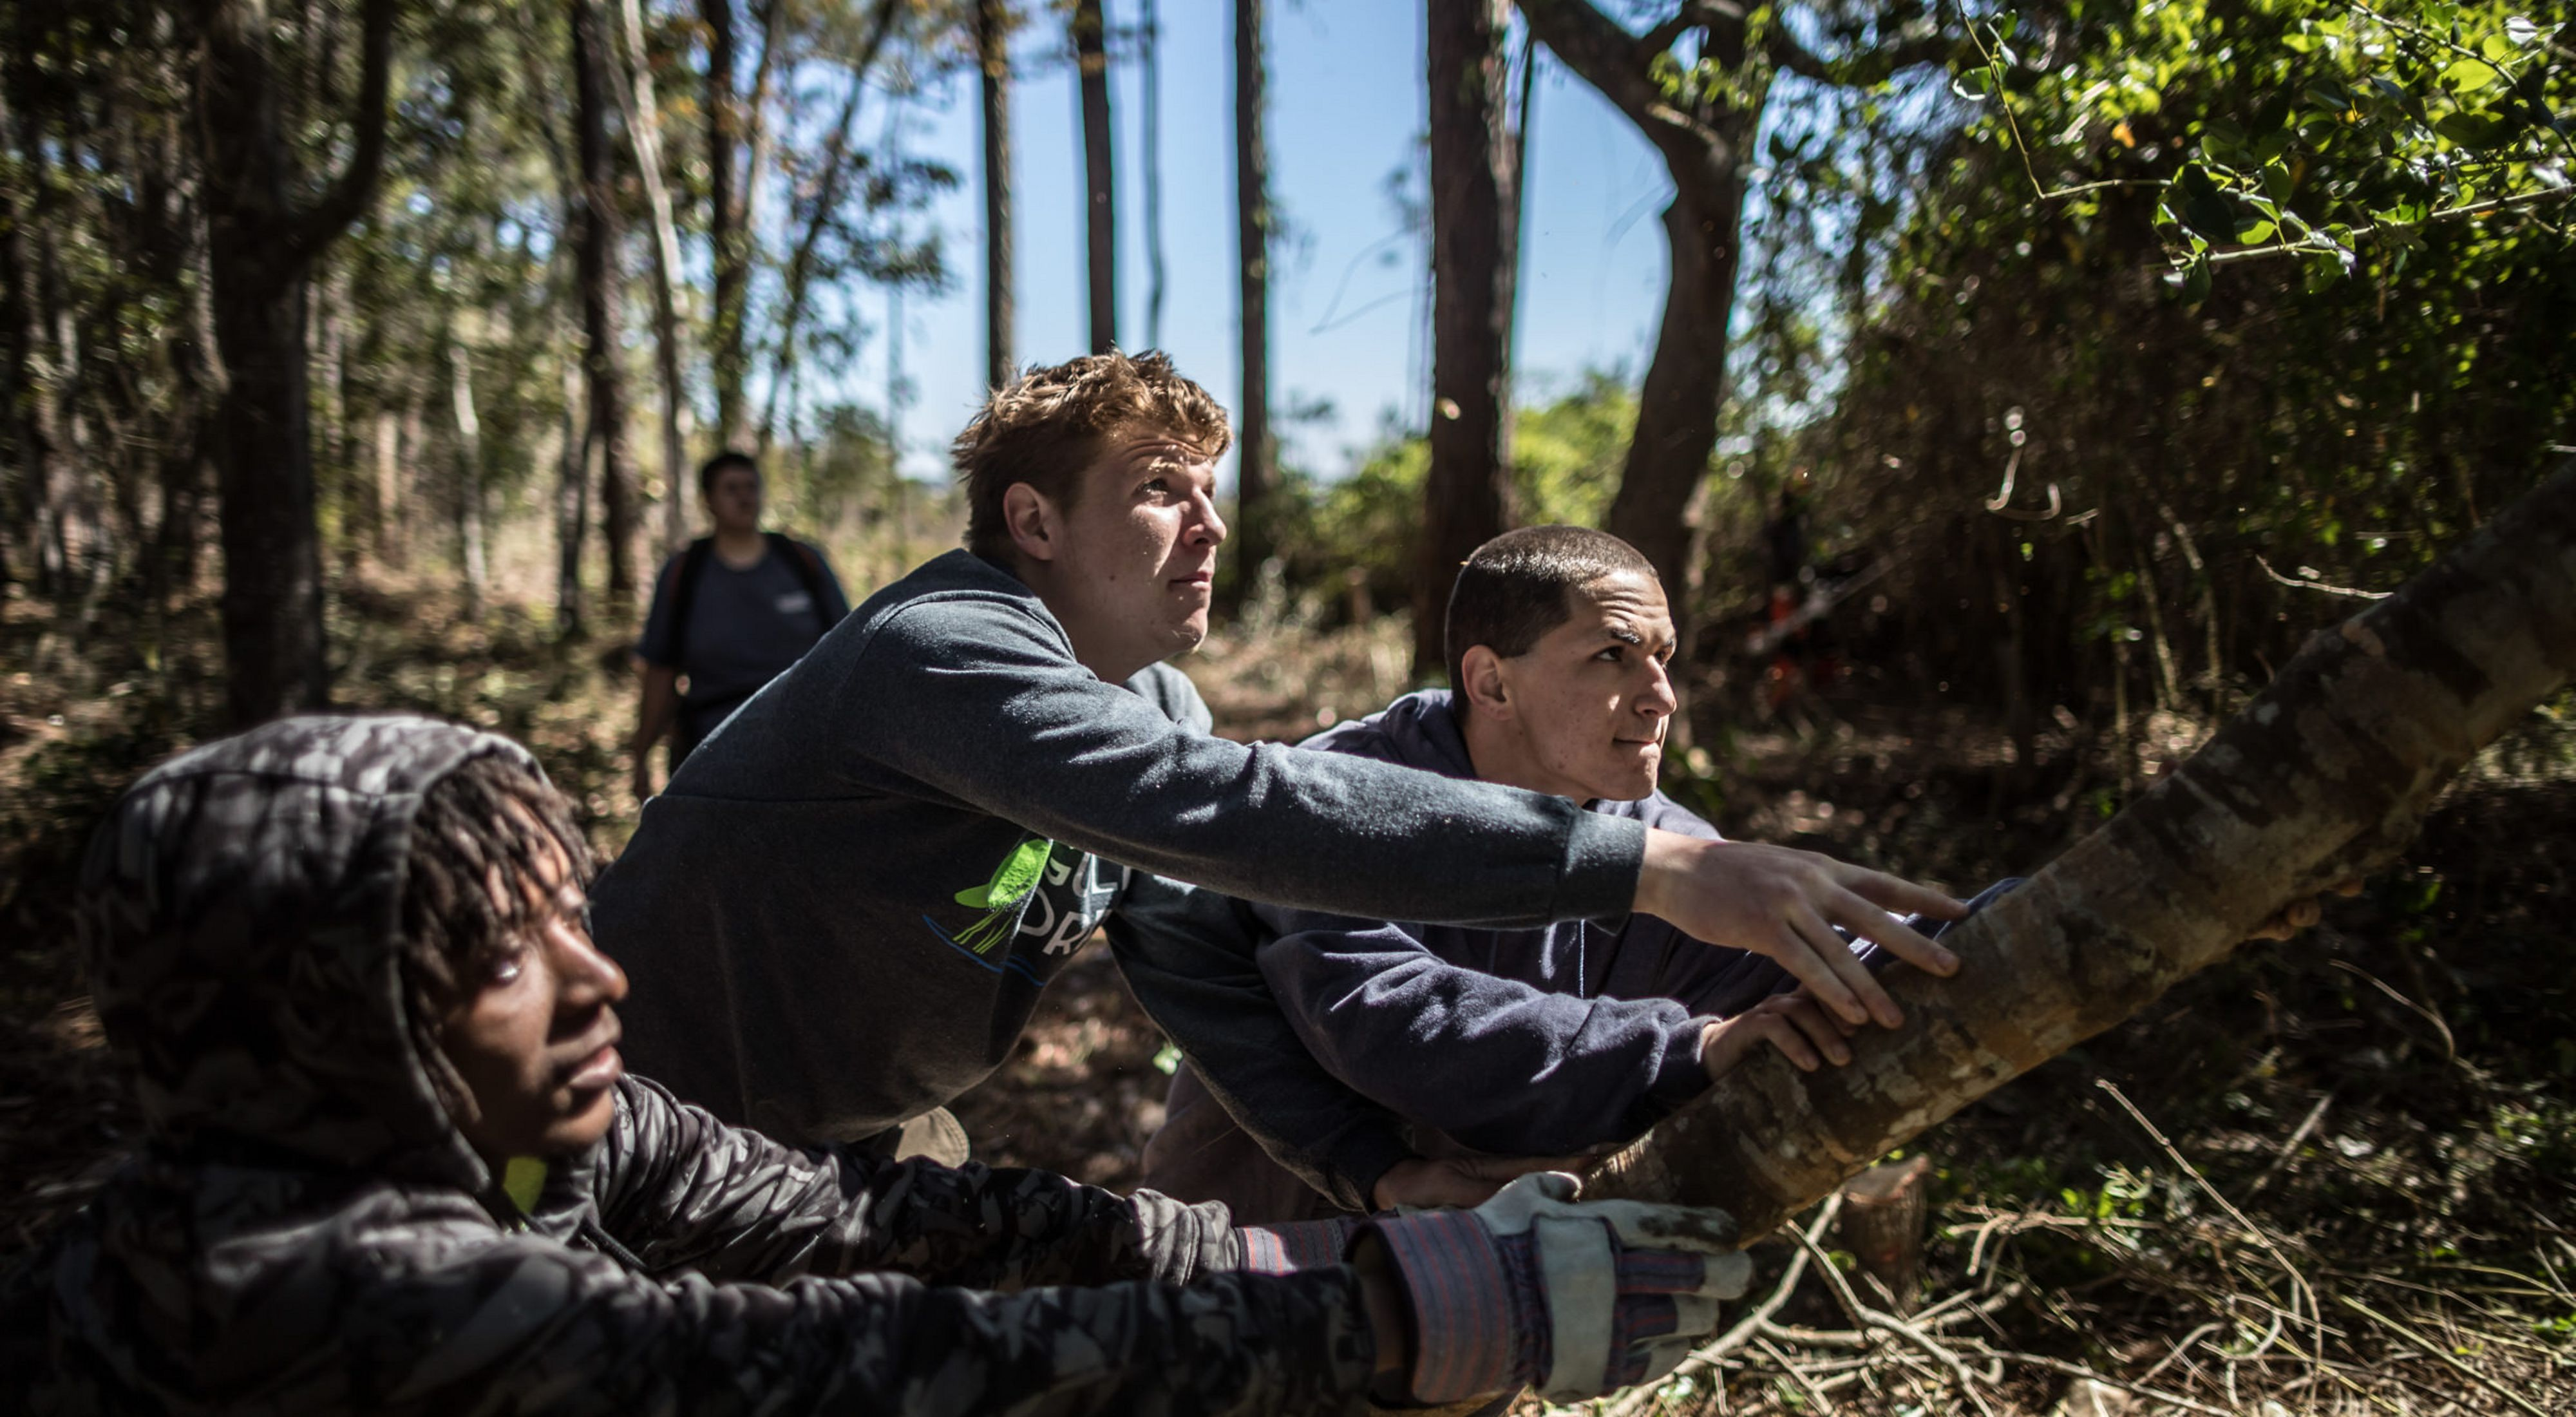 Three young men push down a cut tree to help restore habitat.